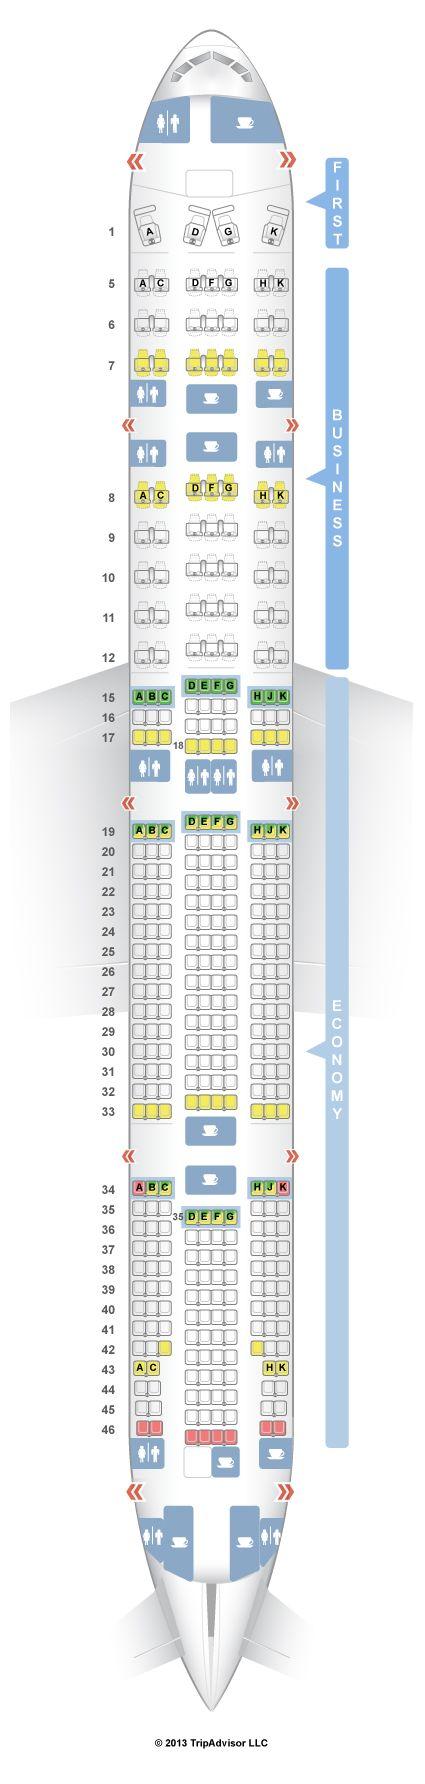 SeatGuru Seat Map TAM Boeing 777-300 (777) V1